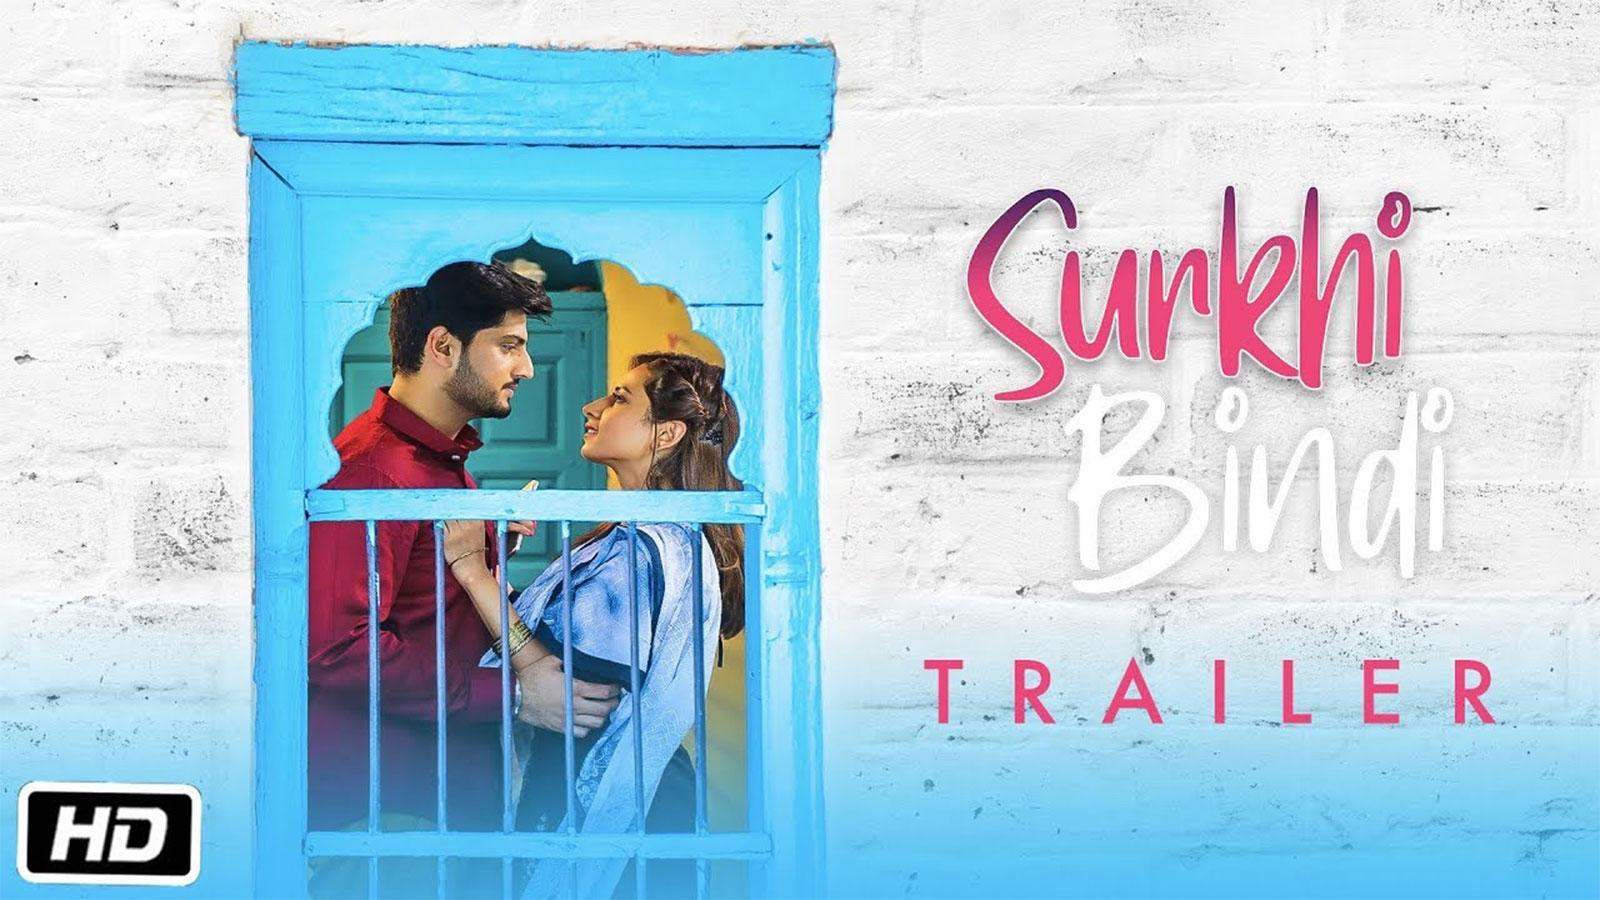 Surkhi Bindi - Official Trailer